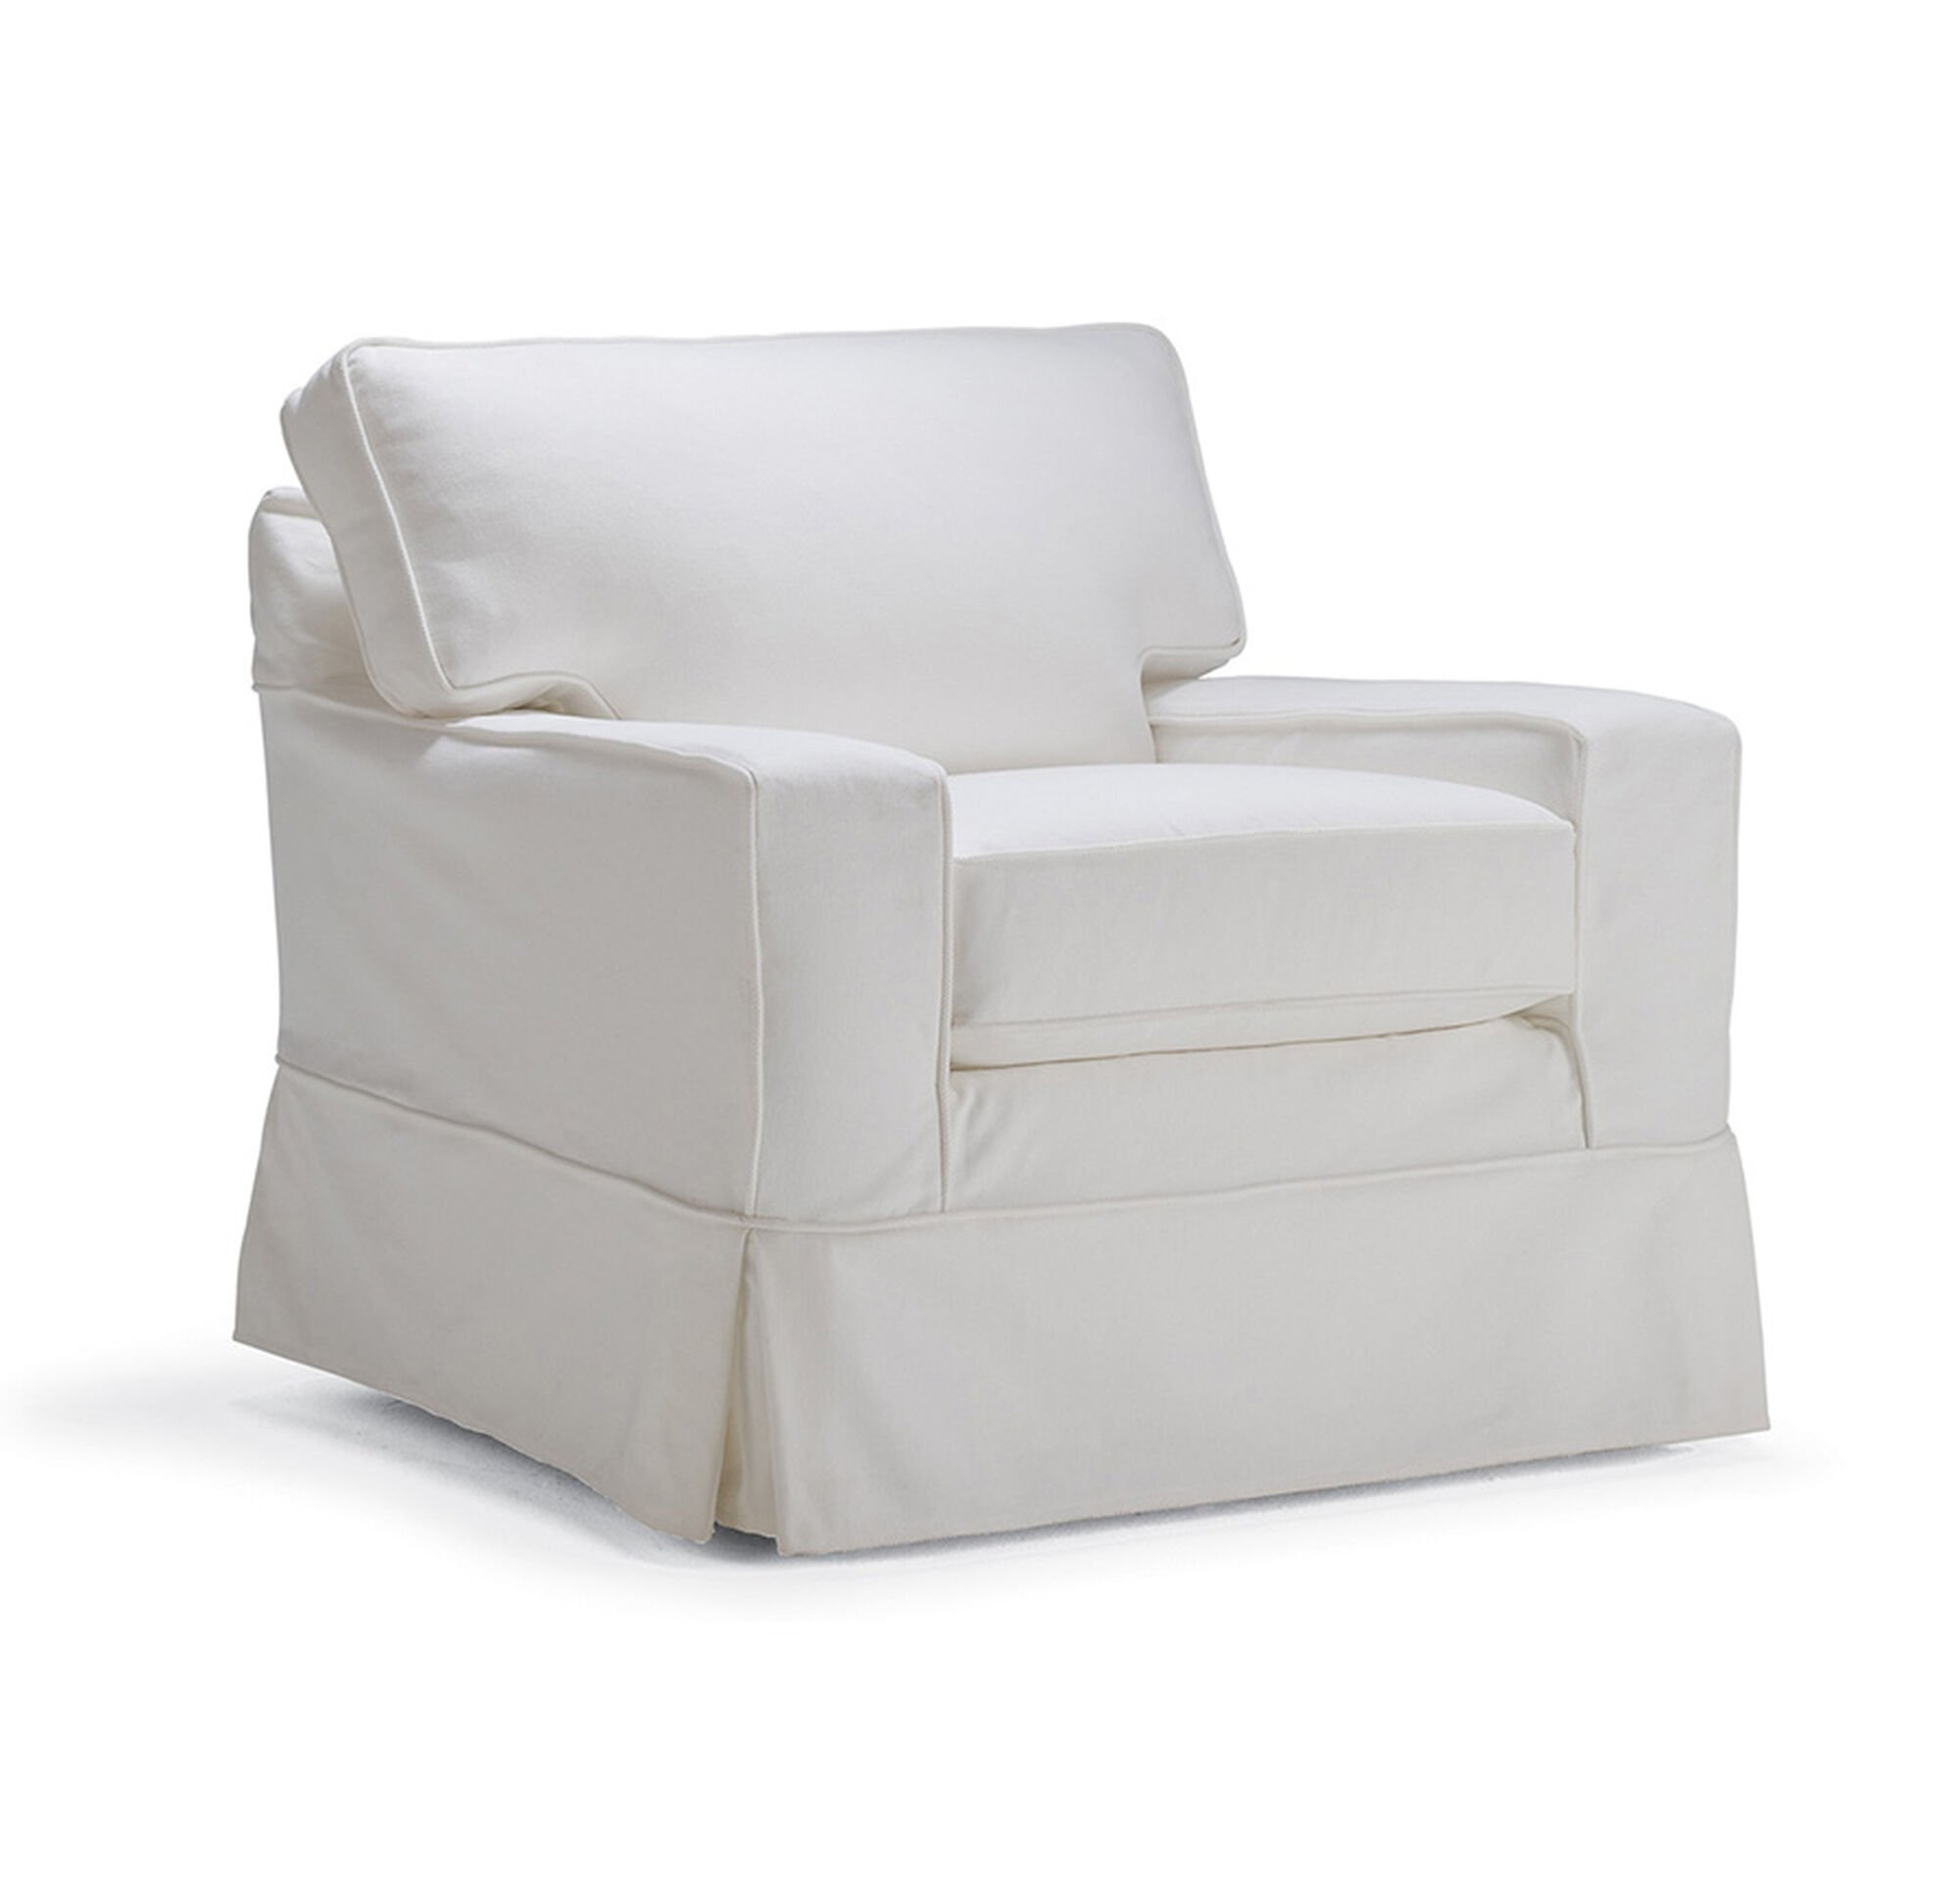 Alex Ii Swivel Glider Chair Slipcover